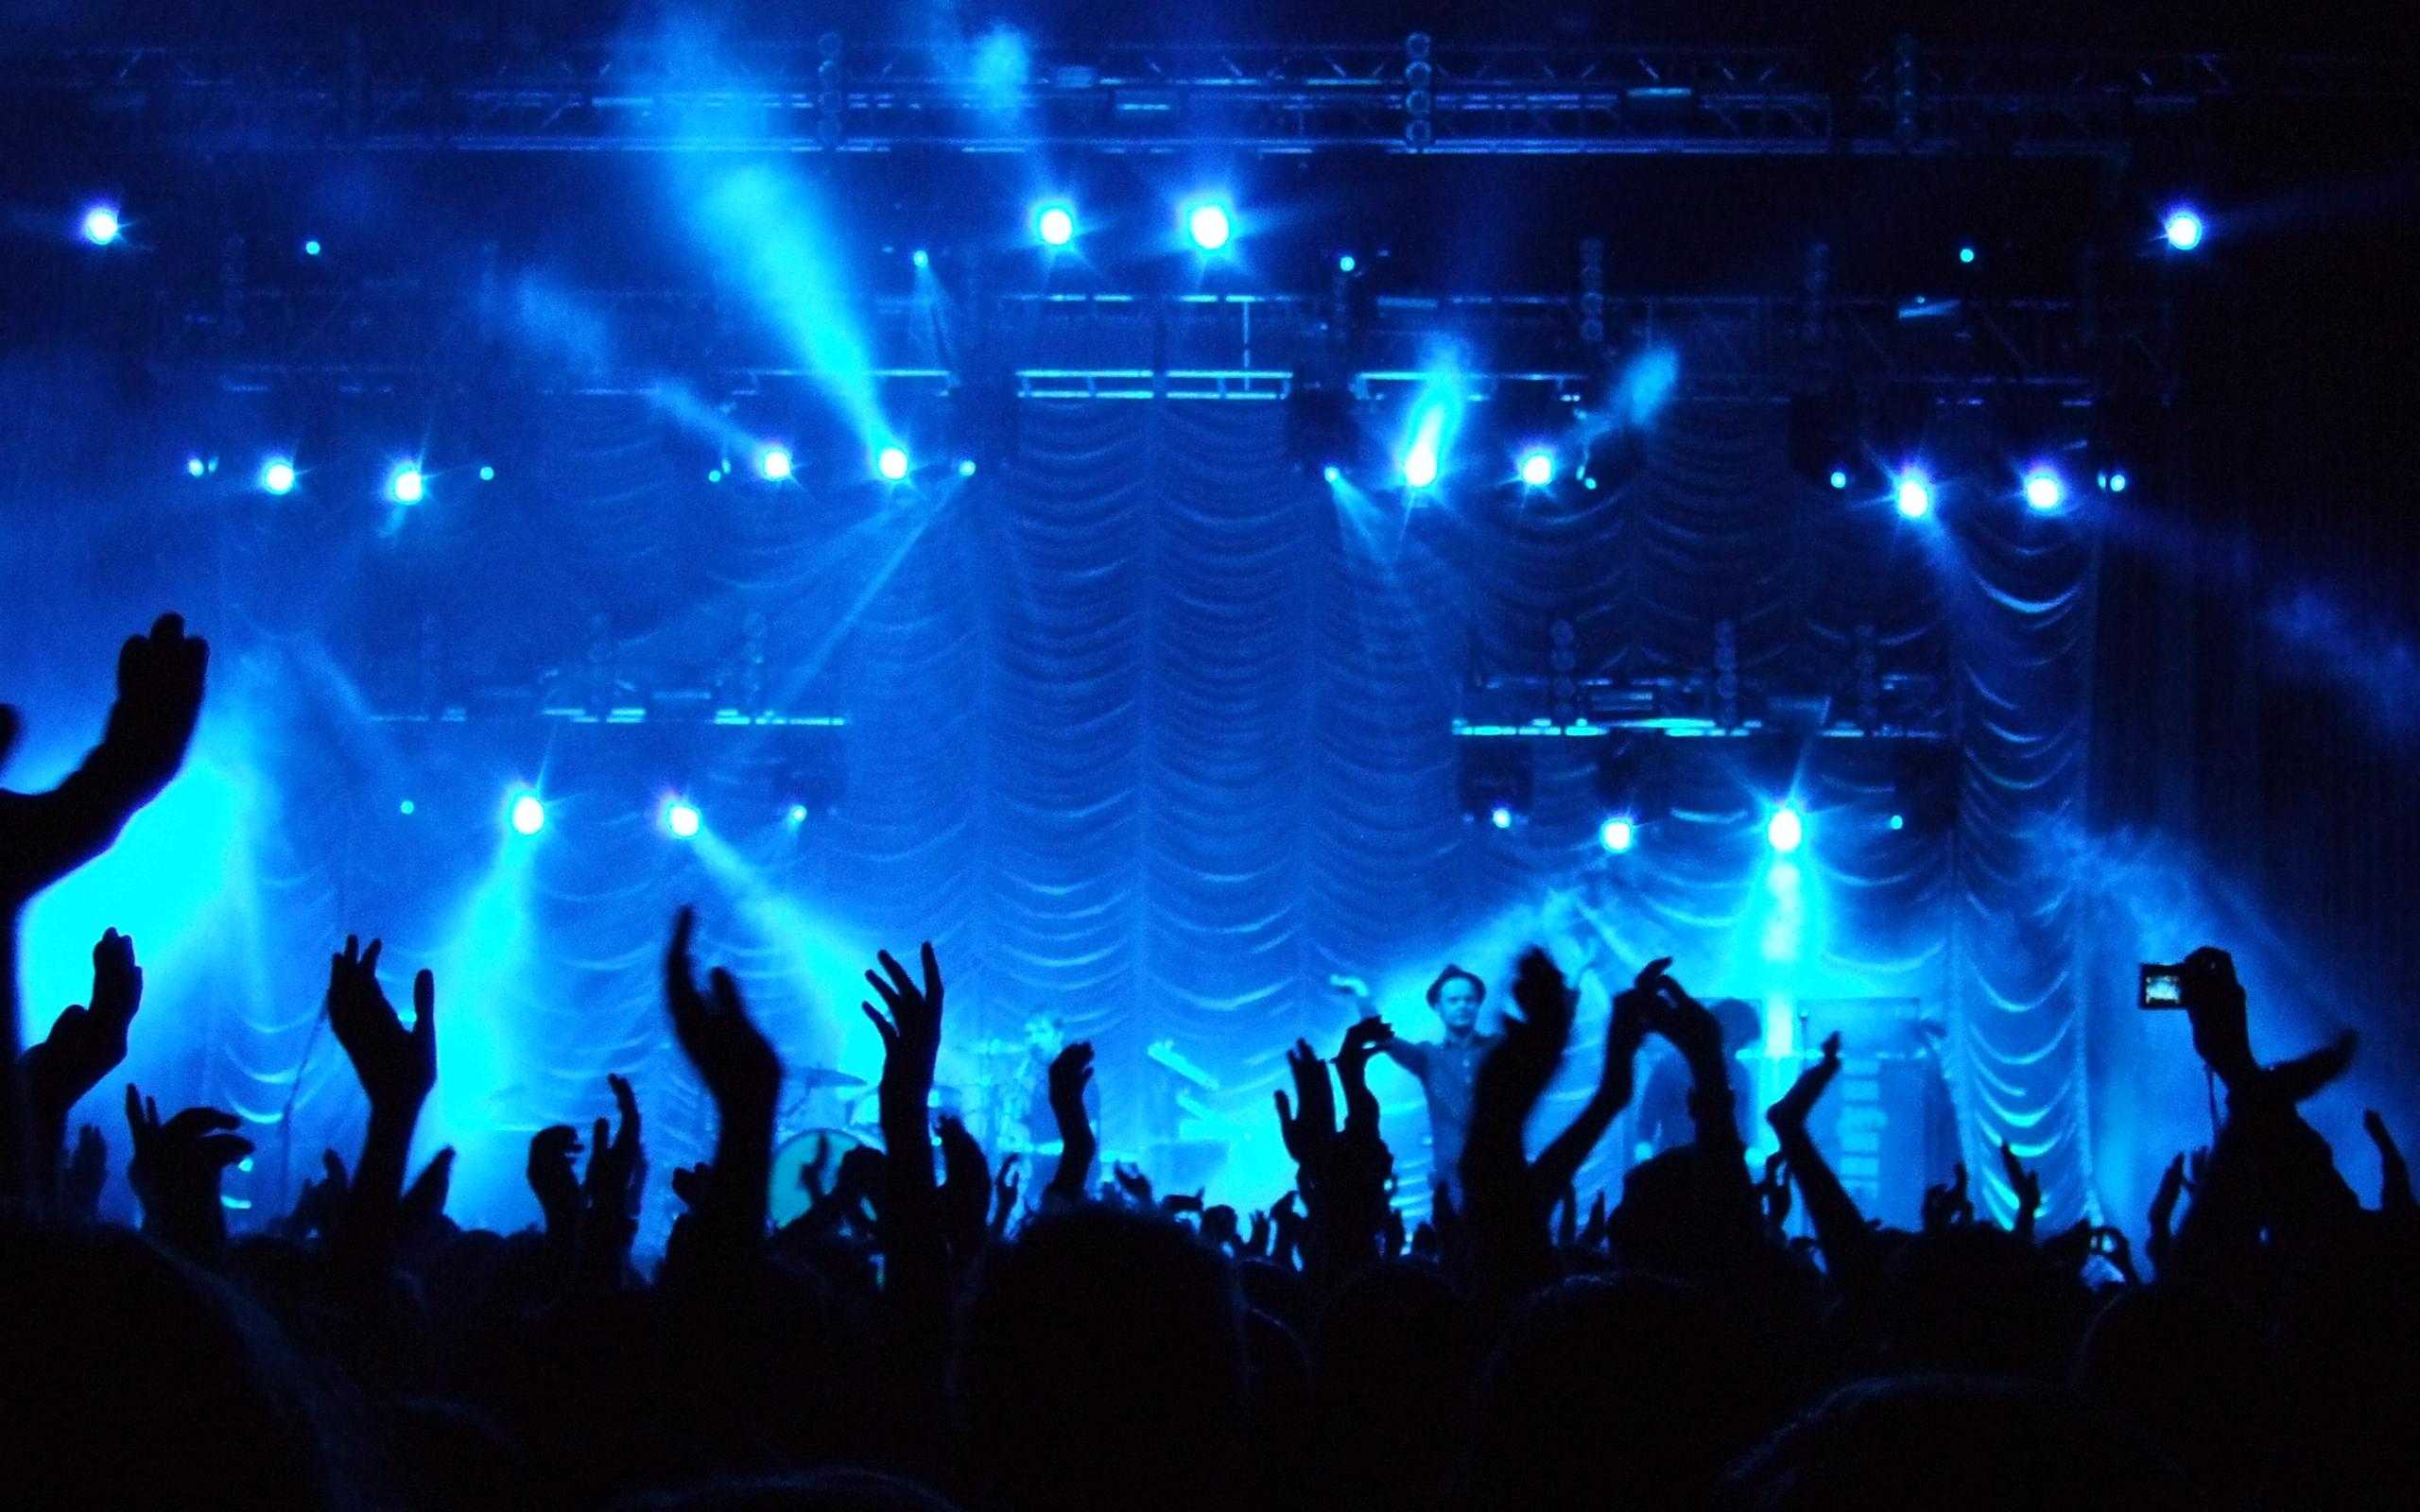 Pop Music & Prayer | Jackie & Bobby Rock Band Silhouette